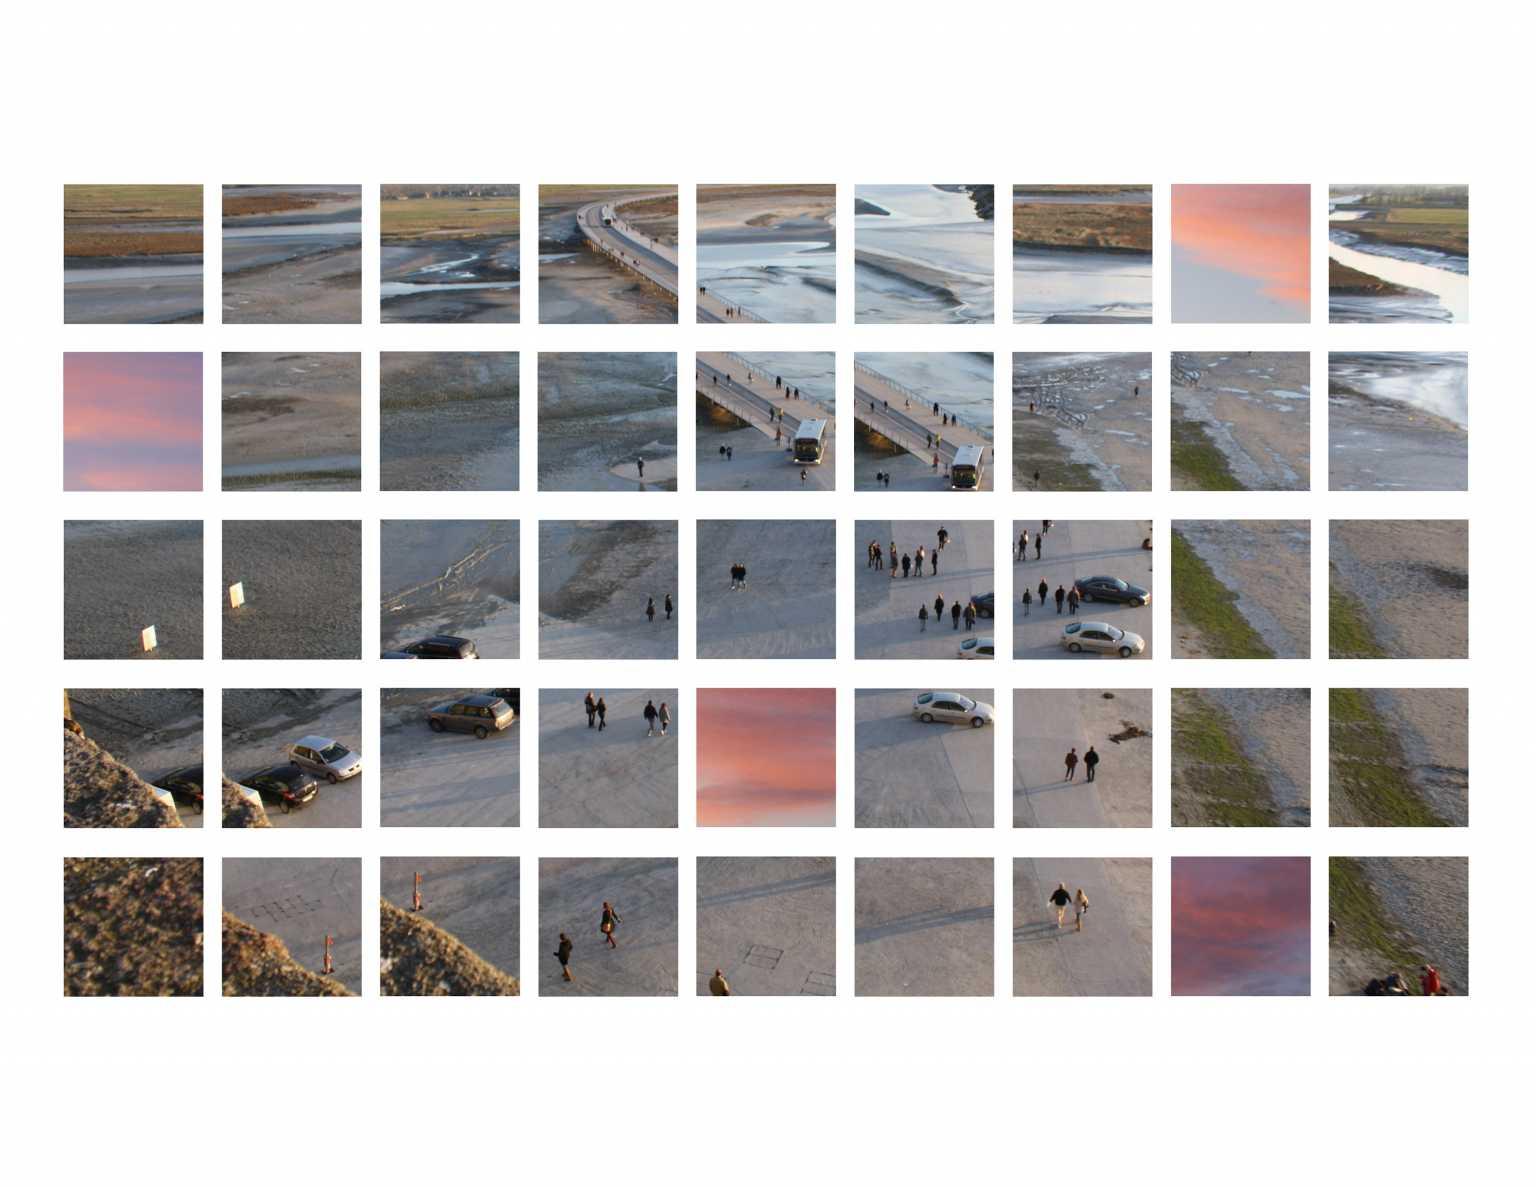 Digital photo project